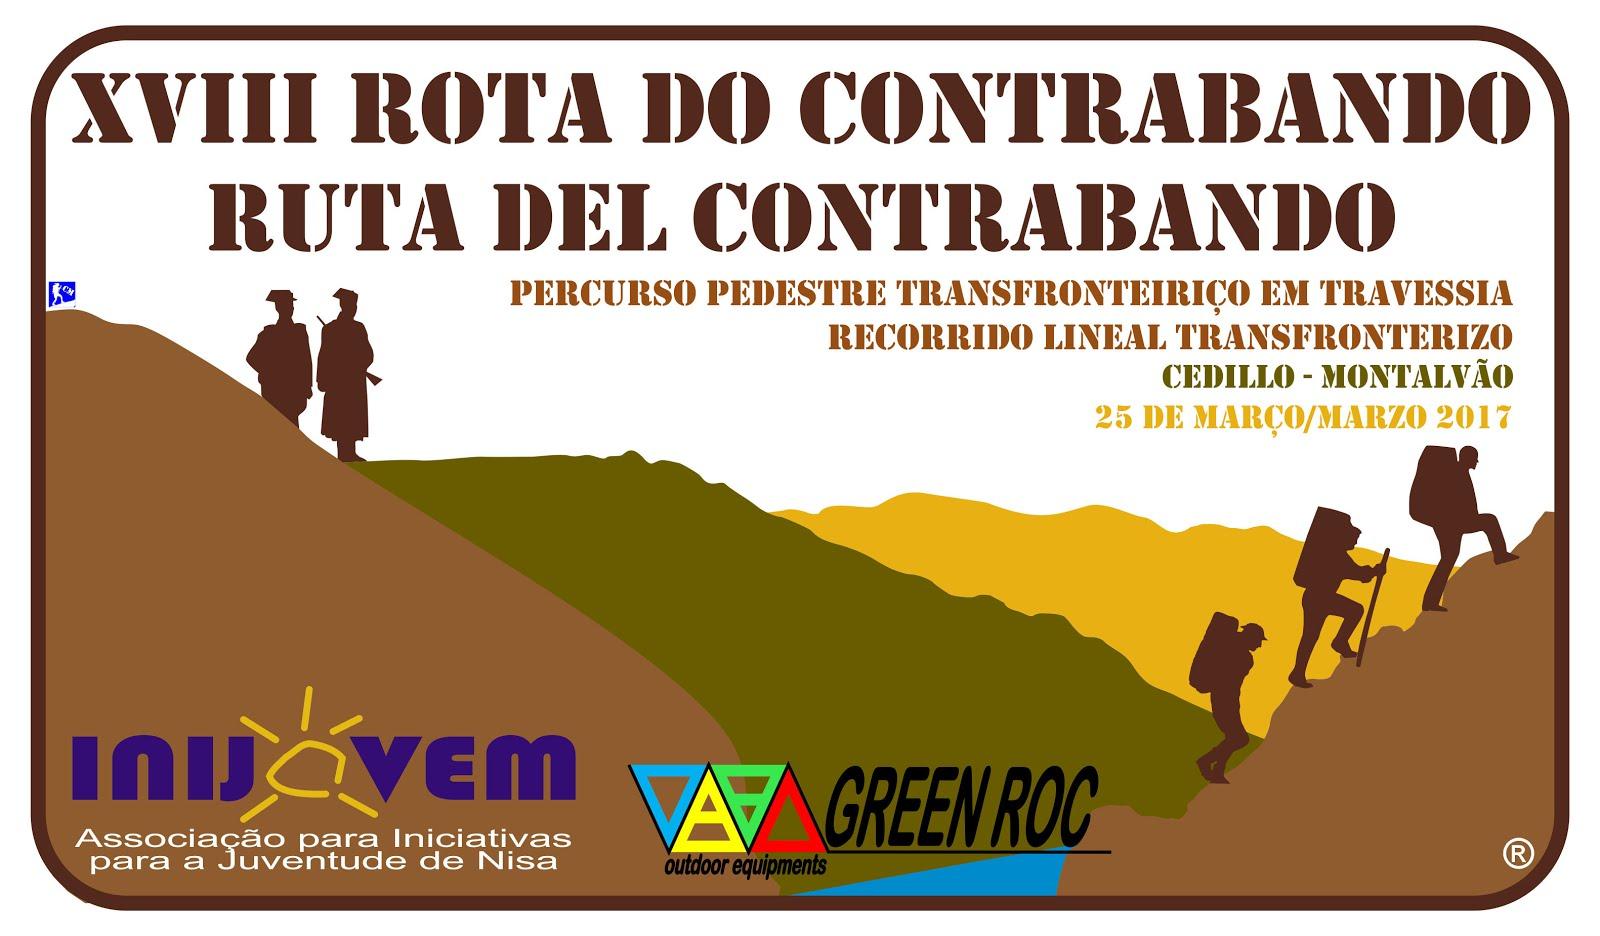 XVIII ROTA DO CONTRABANDO - RUTA DEL CONTRABANDO